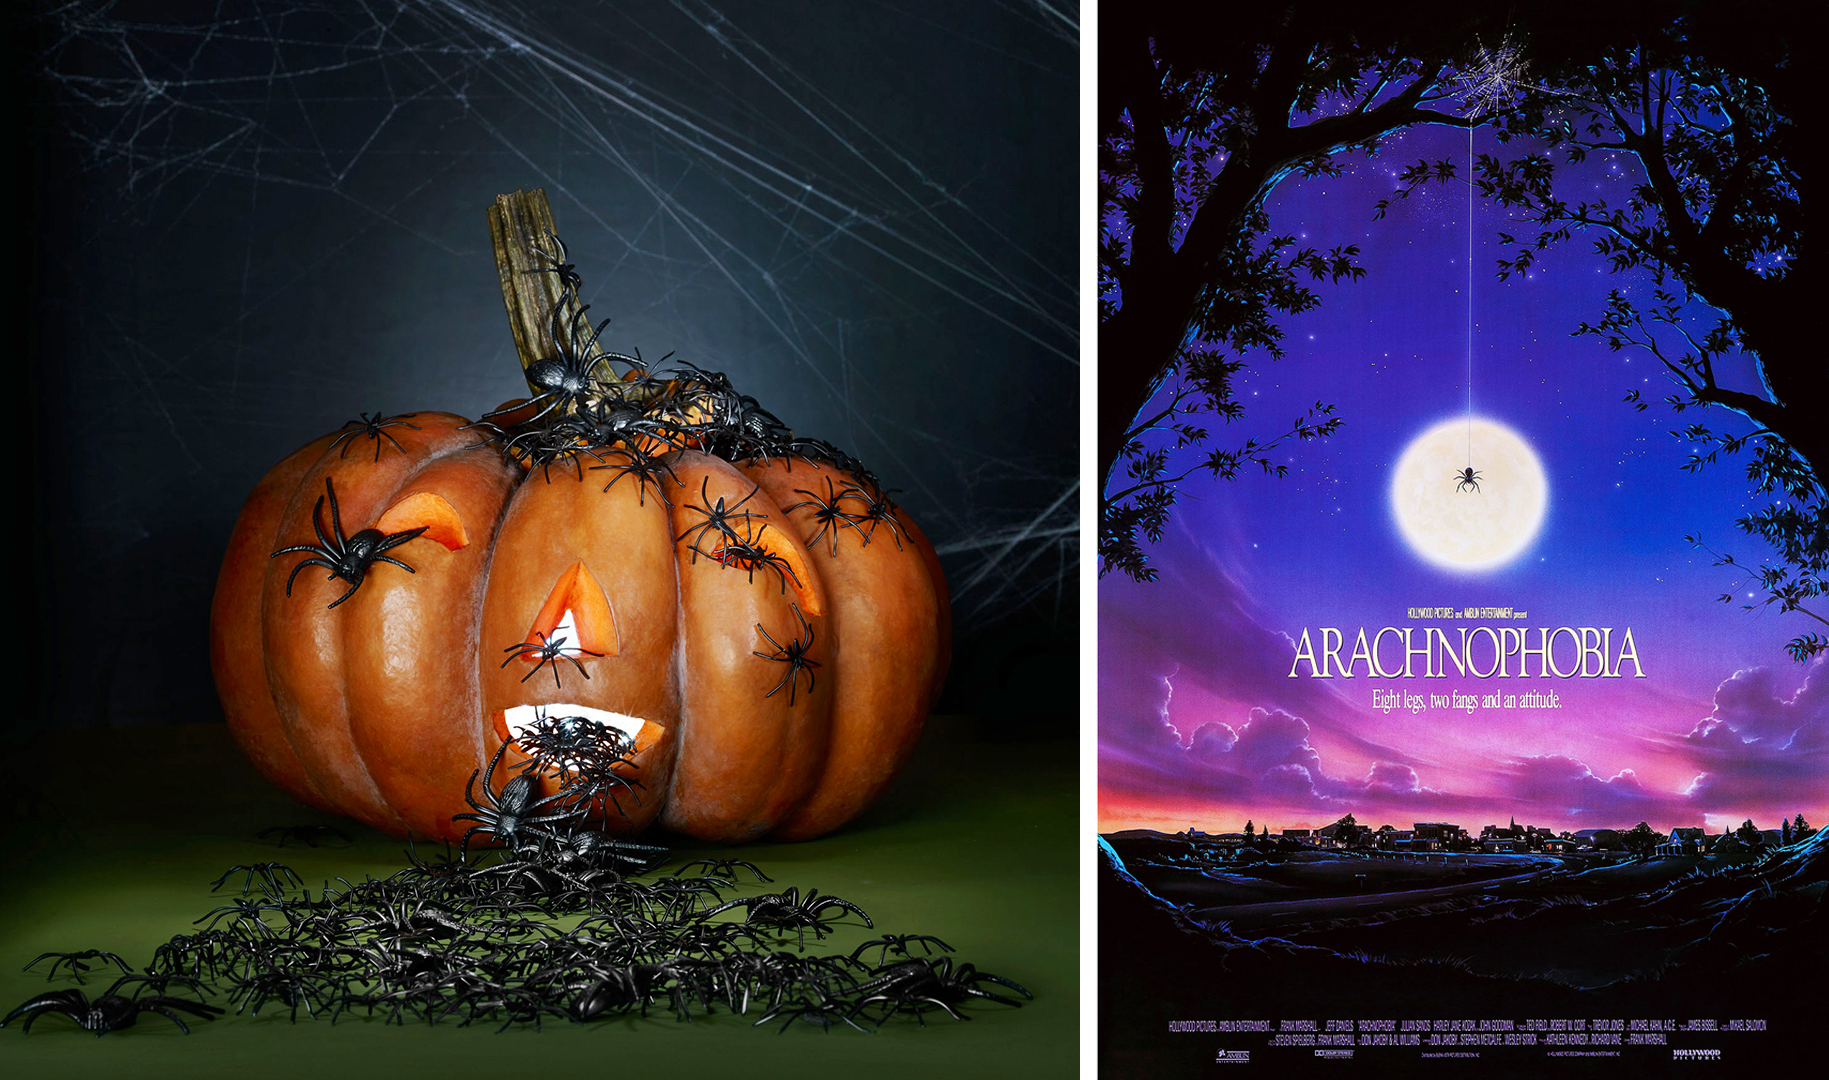 arachnophobia pumpkin and poster